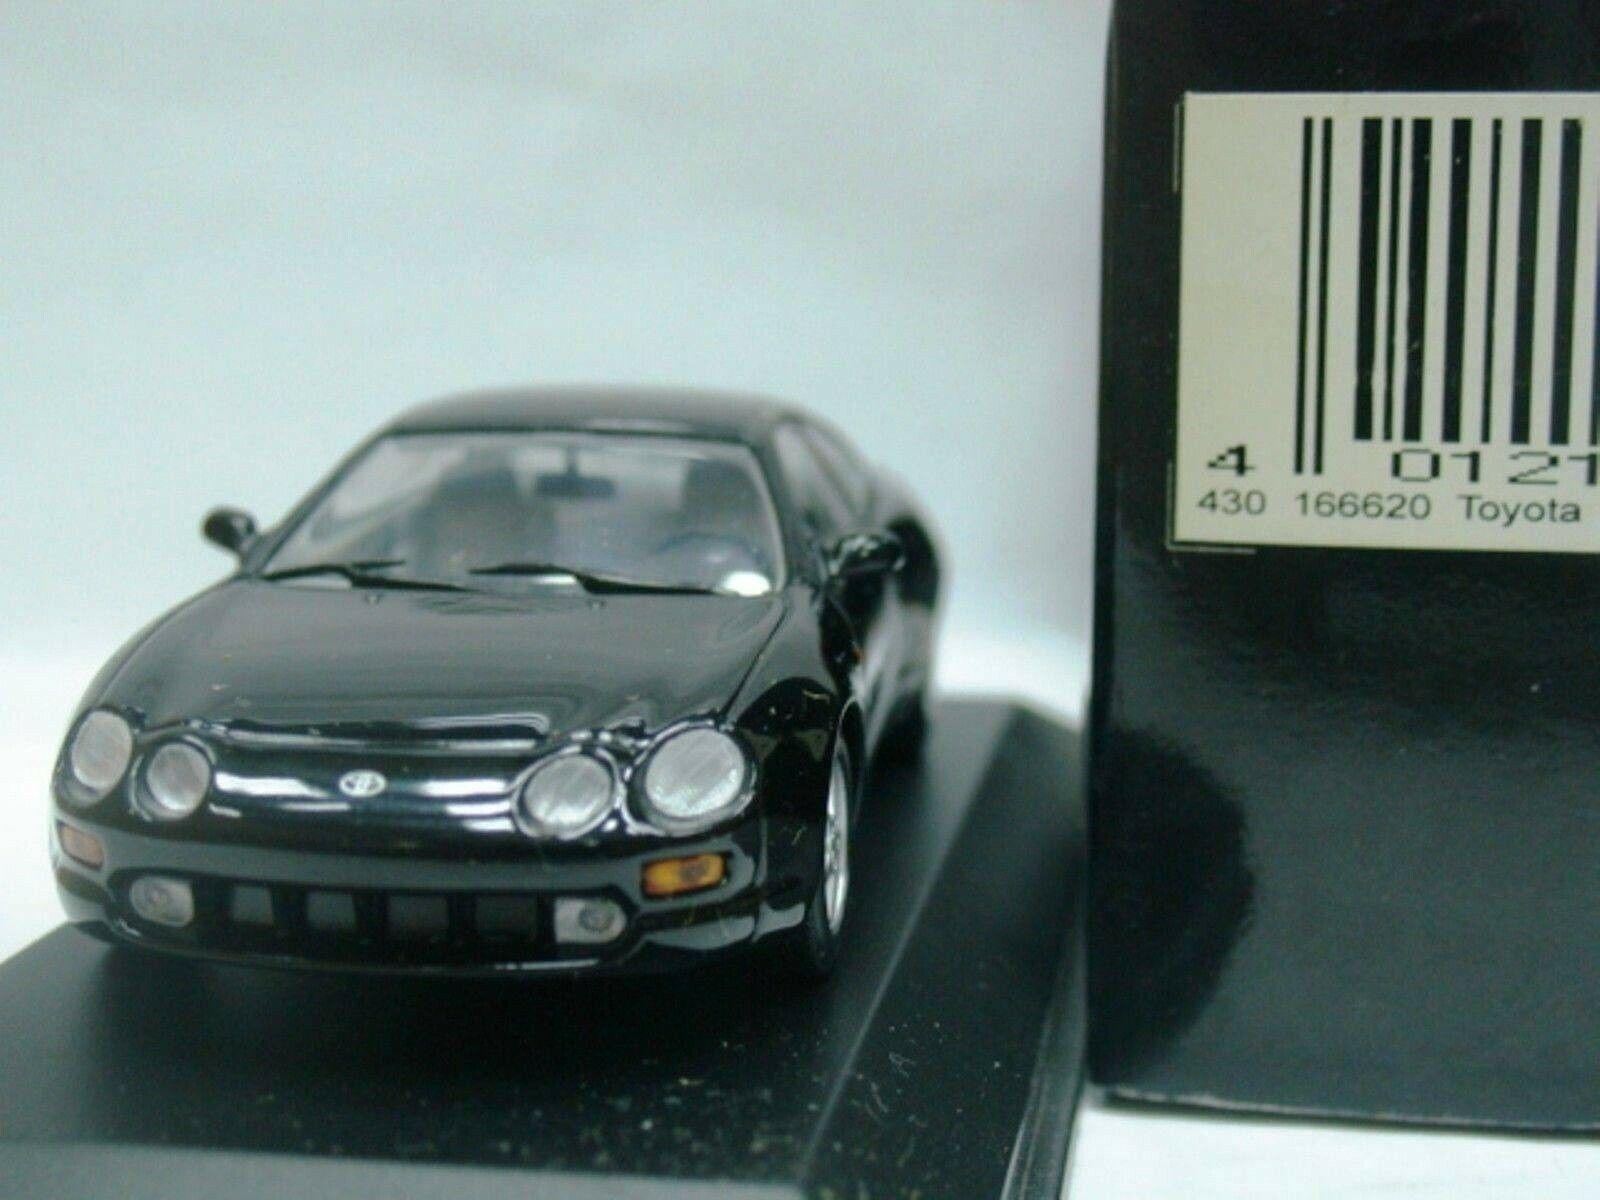 Wow extremadonnate raro 1994 Toyota Celica ST202 Ss-ii Gt Coupe nero 1 43 Minichamps